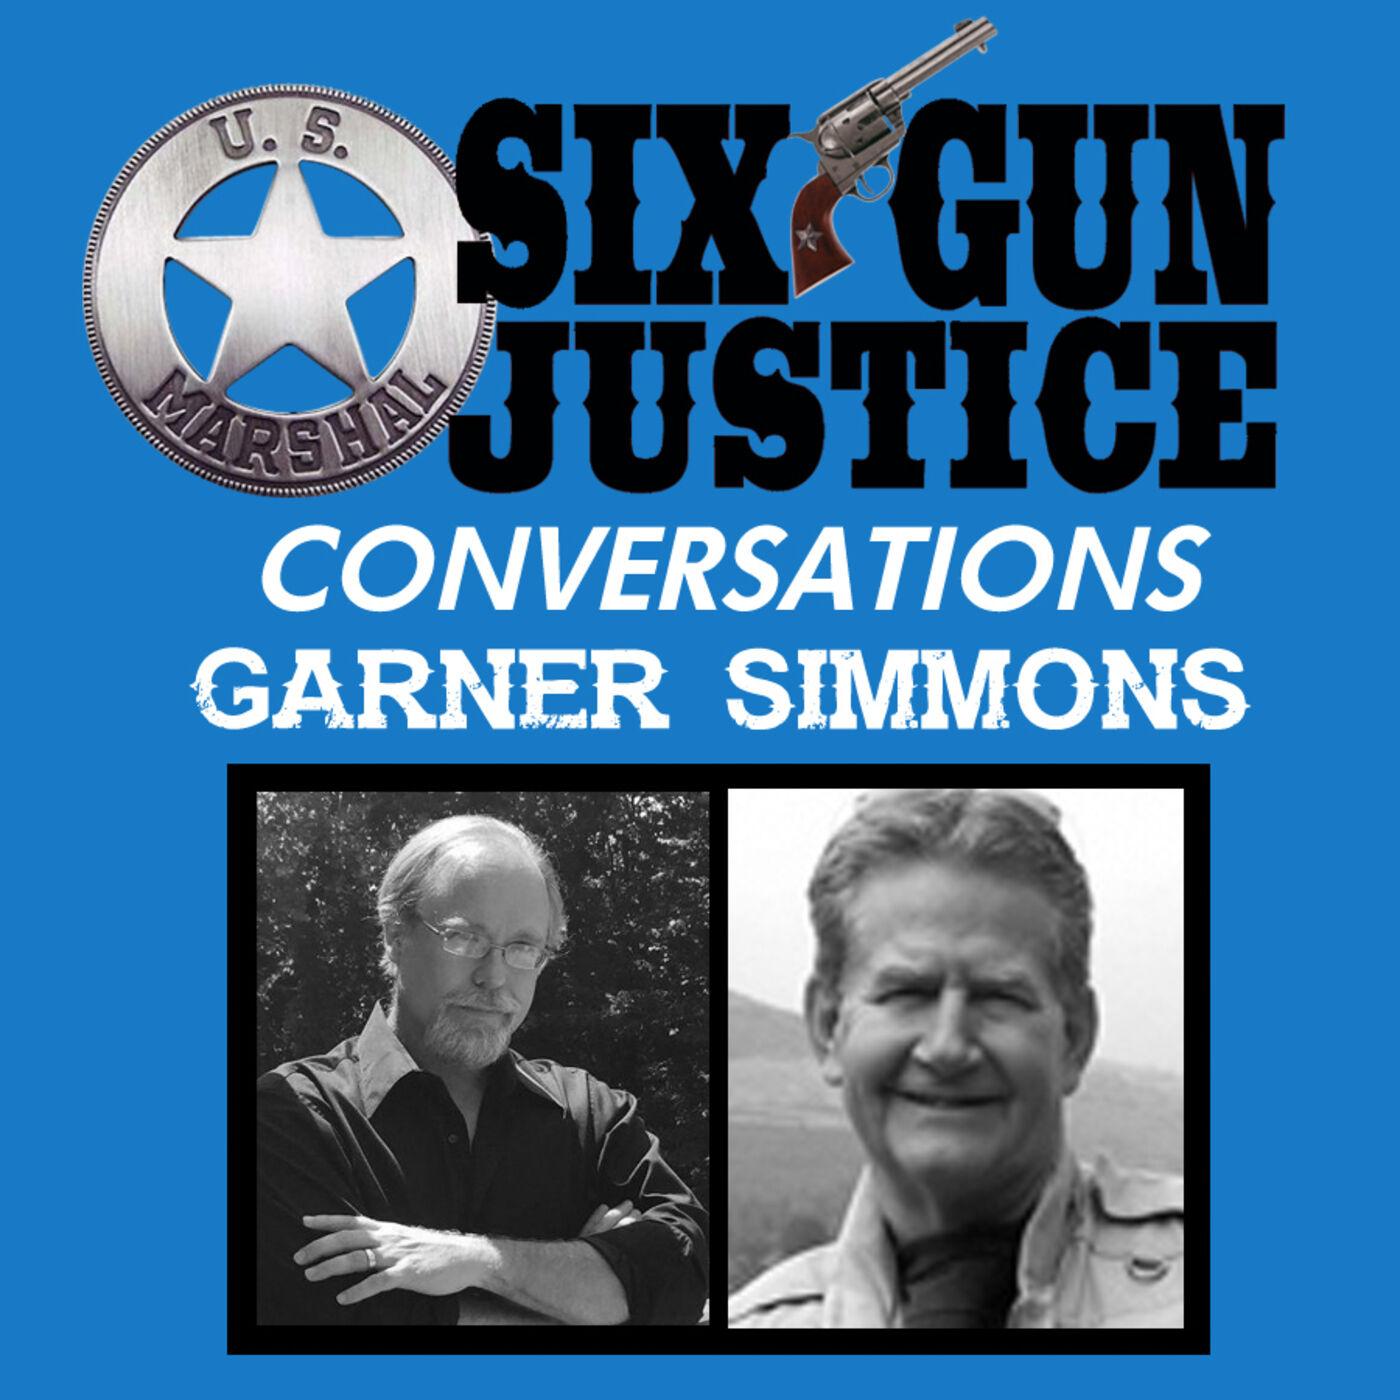 SIX-GUN JUSTICE CONVERSATIONS—GARNER SIMMONS